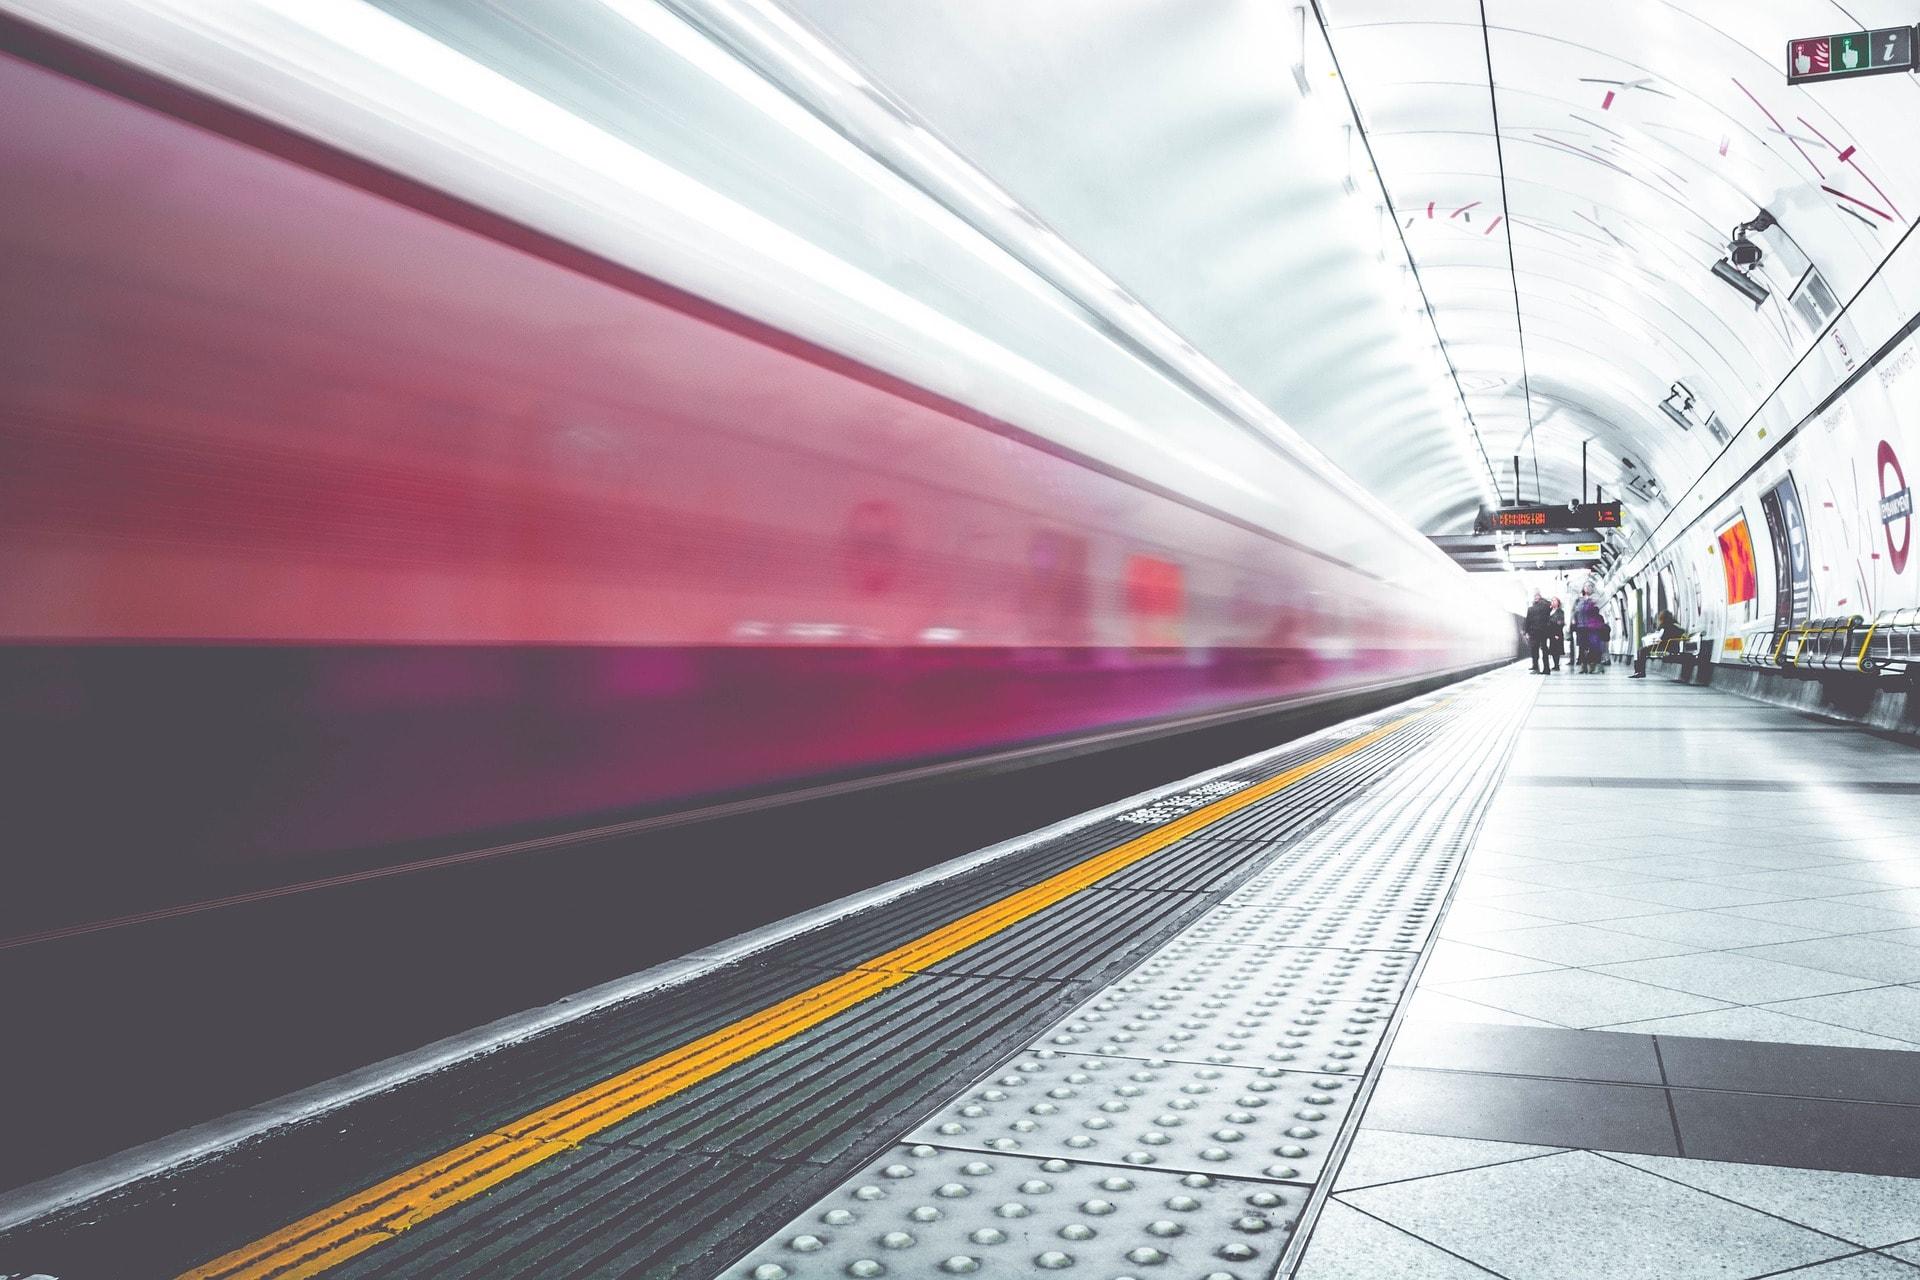 Ubiquity Consulting Underground London